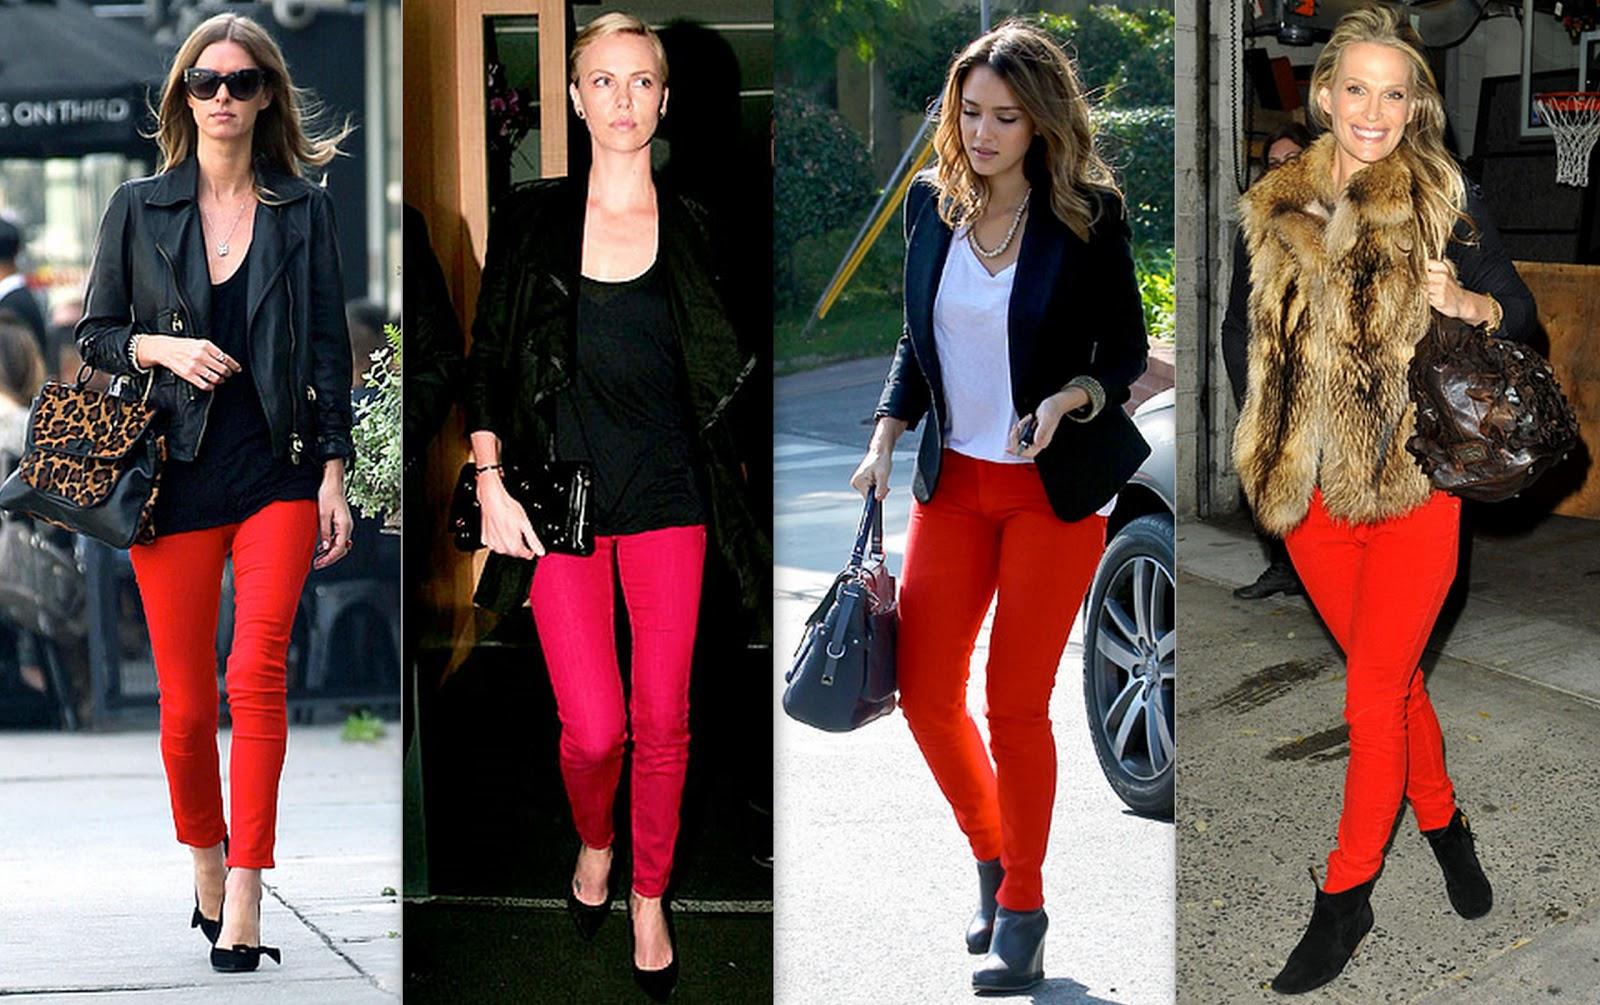 http://2.bp.blogspot.com/-YR922EAcYRU/TwnhMlGmmXI/AAAAAAAABSA/KWMtnyZQSDg/s1600/red+jeans+trend1.jpg